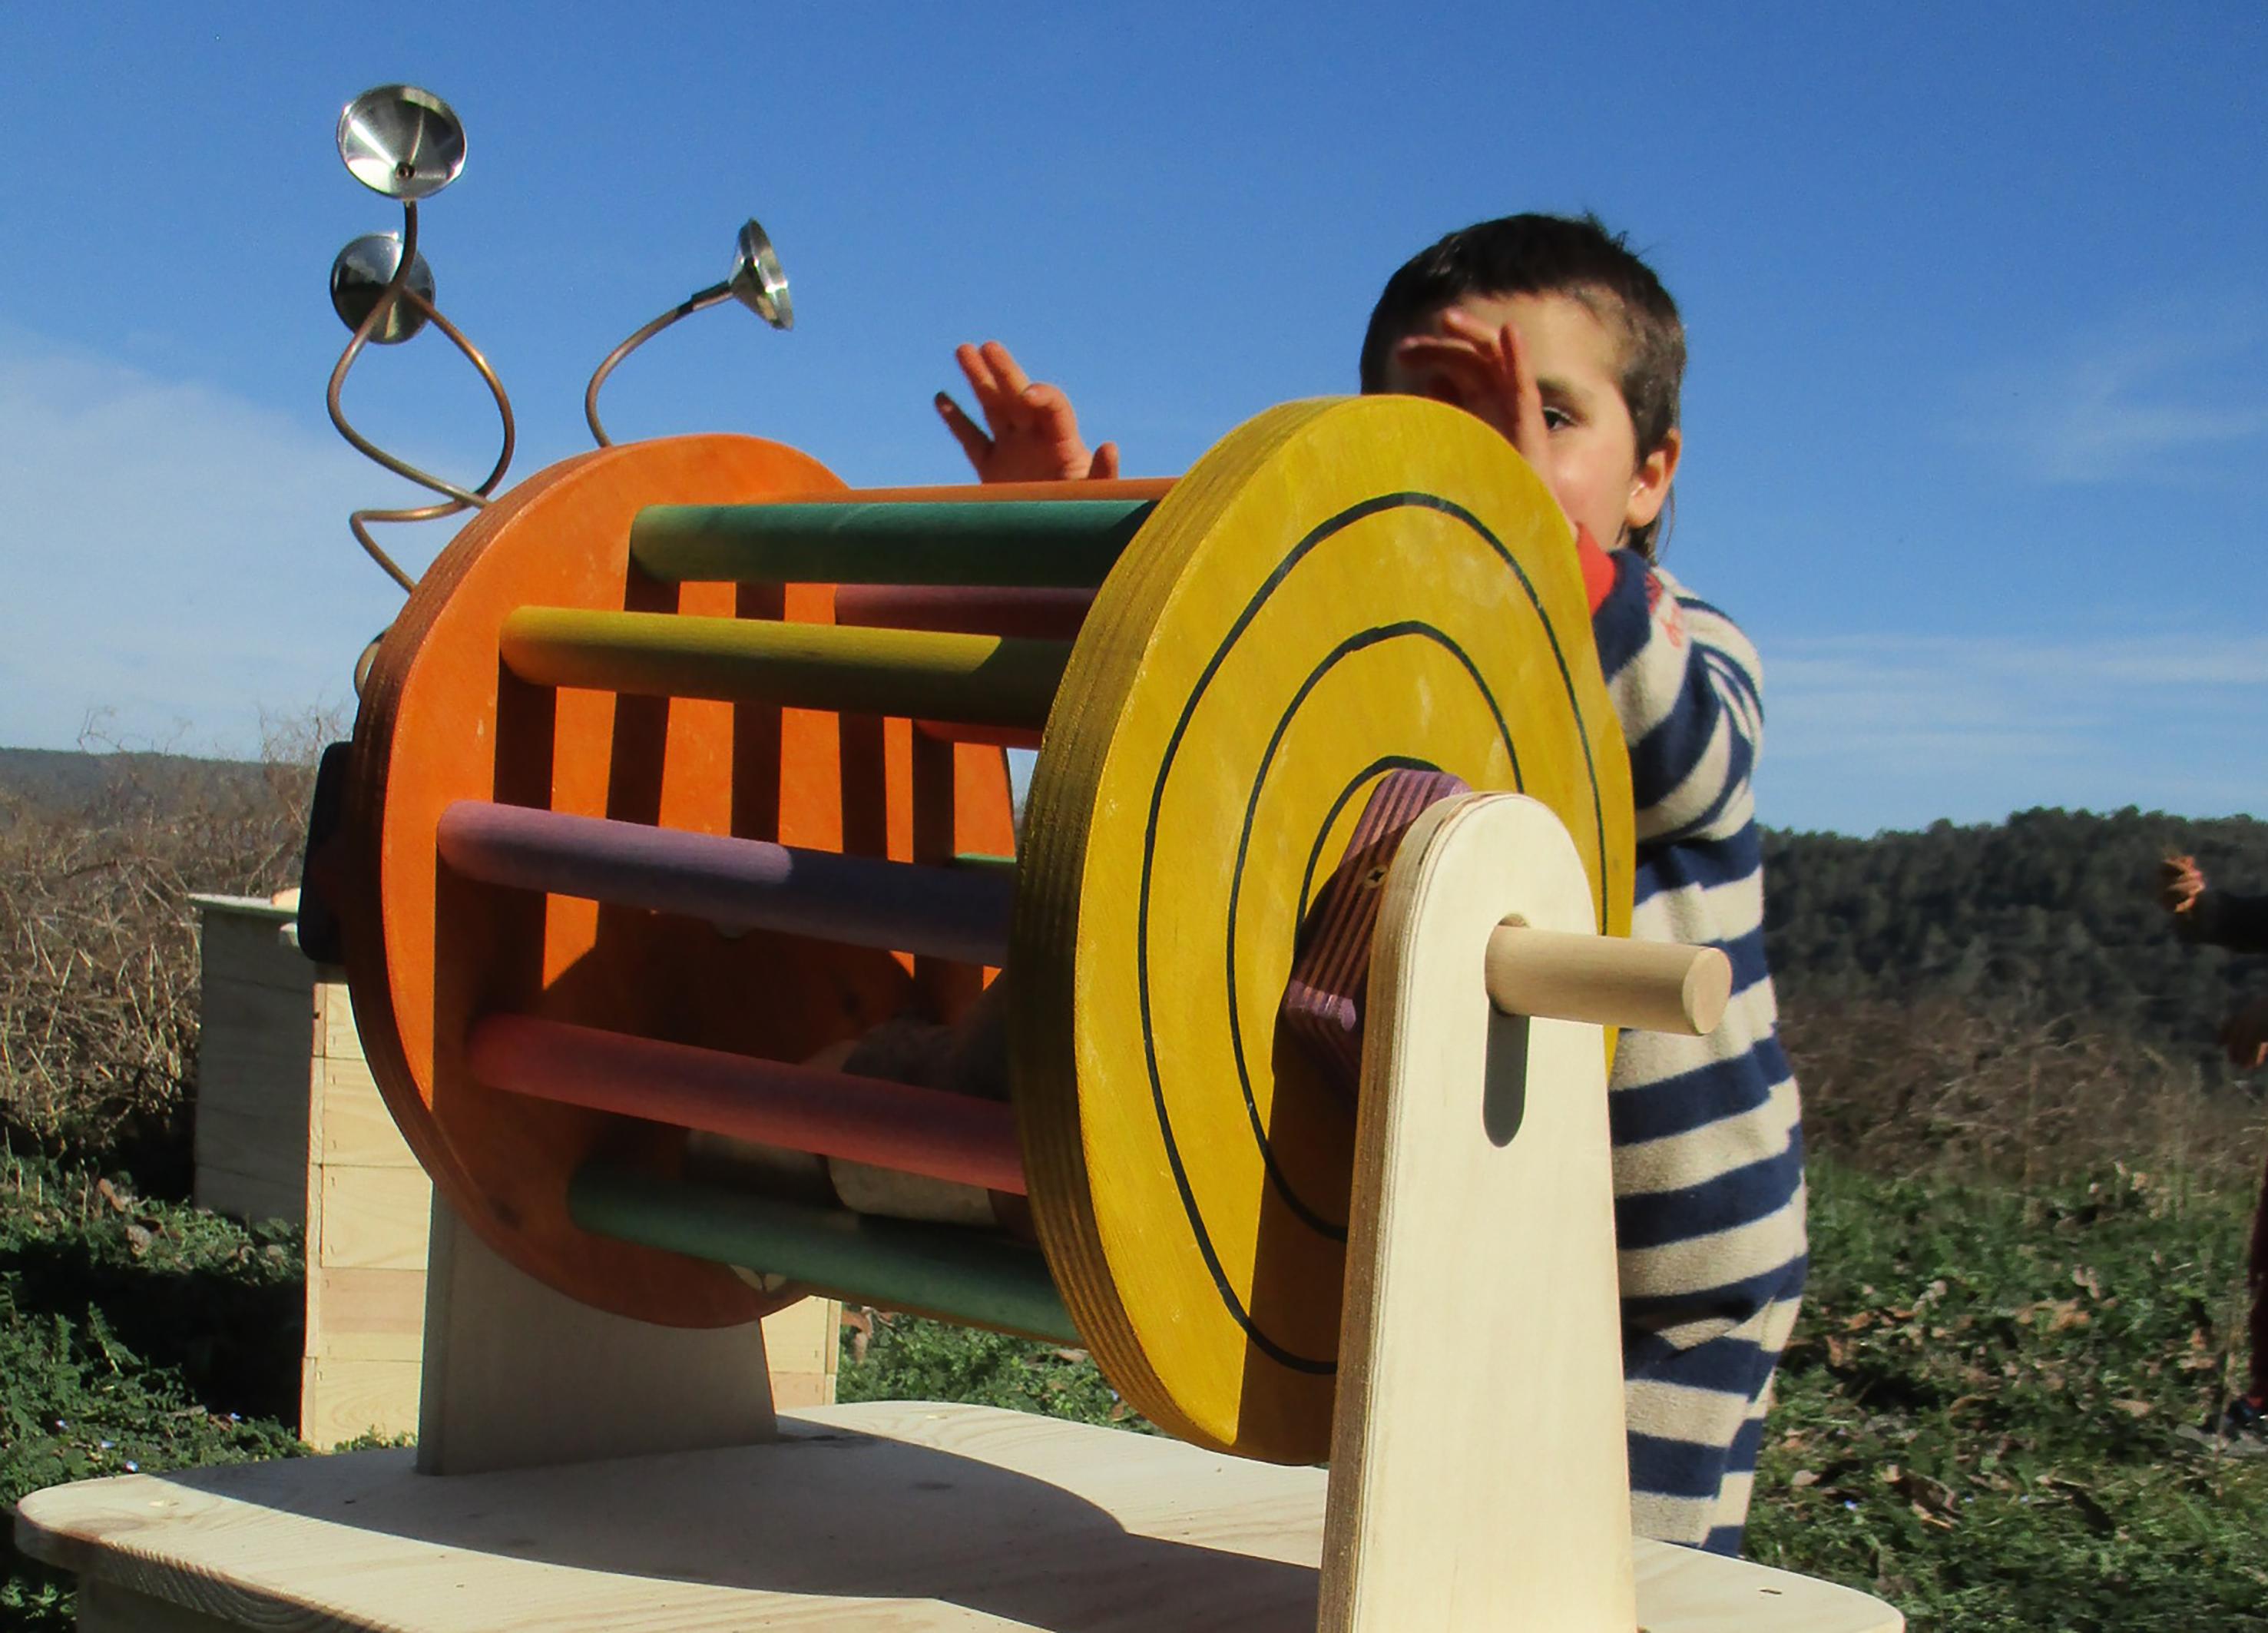 Family fun and traditions at the Palauet Albéniz